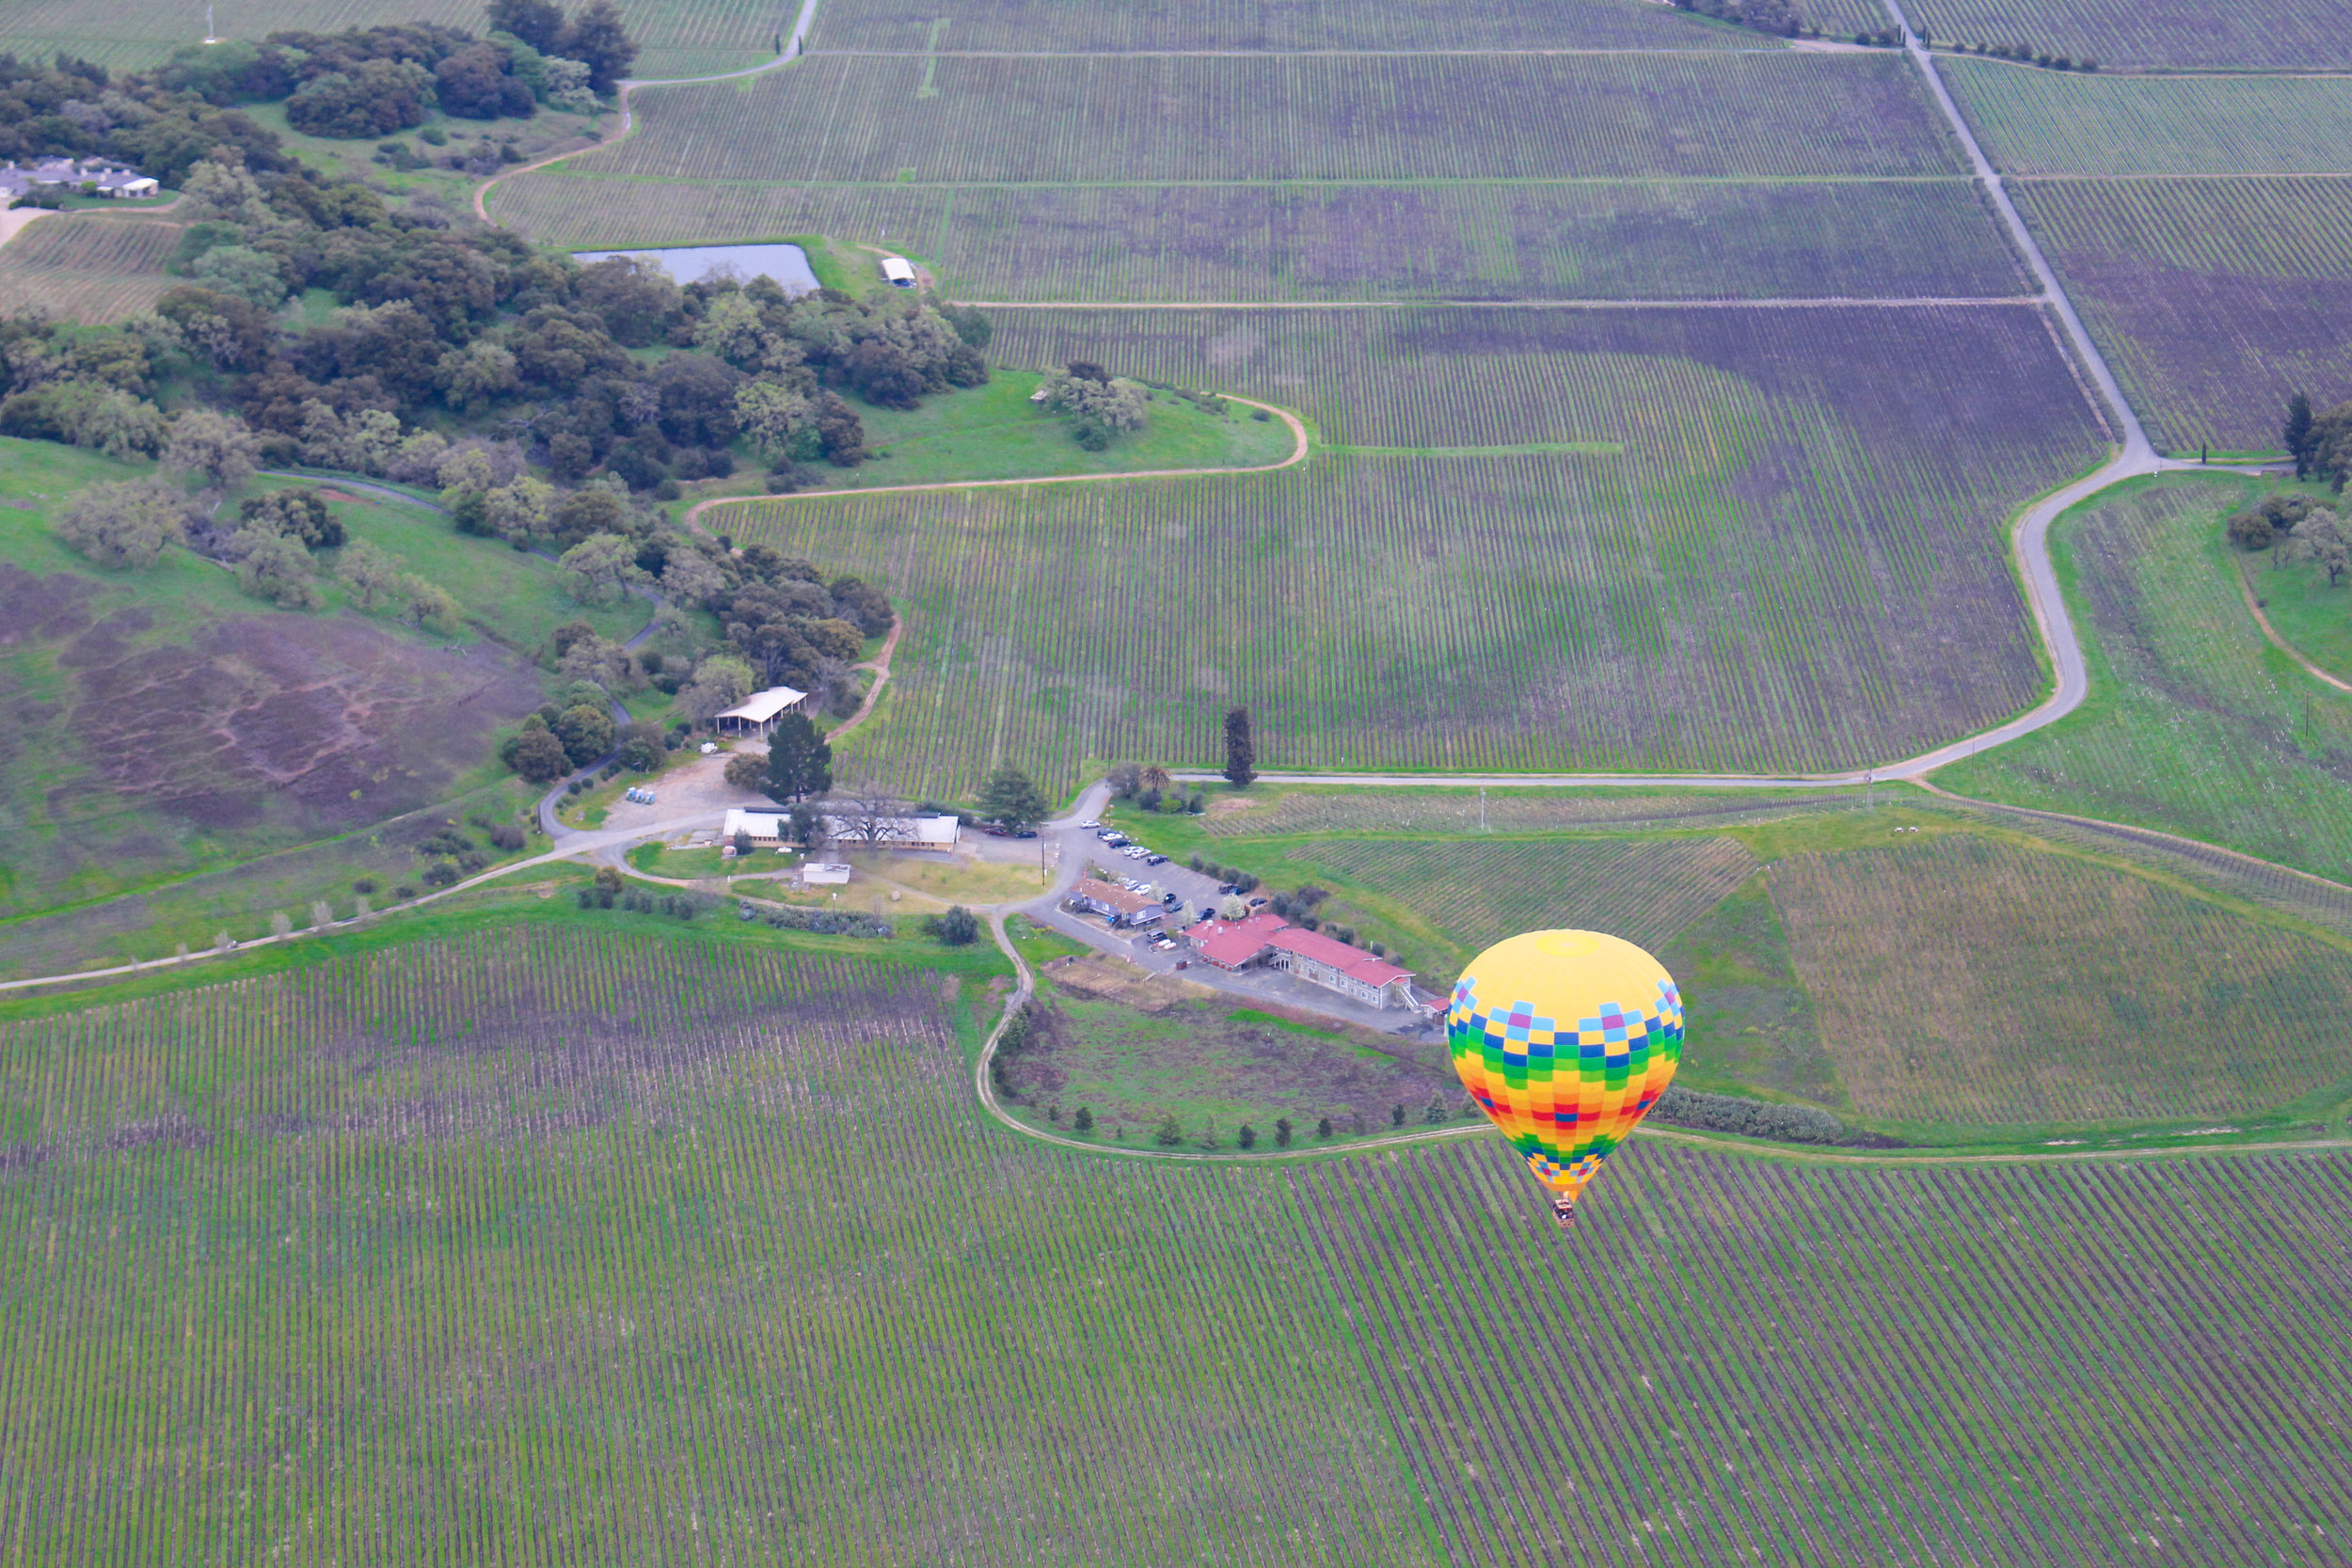 SUGAR & STAMPS - Hot Air Balloon RIDE OVER NAPA VALLEY